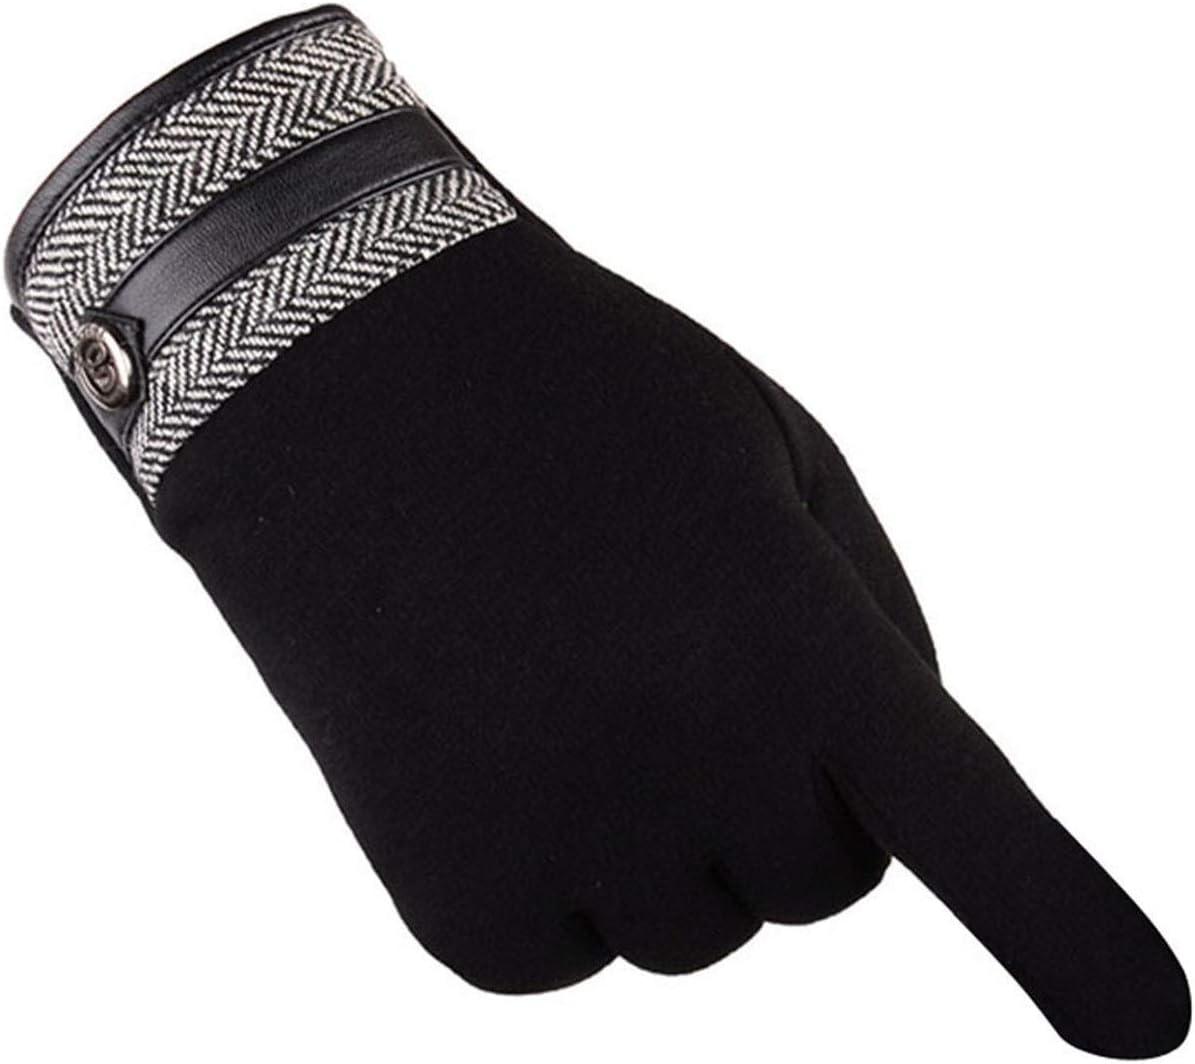 Lupovin-Keep Warm Men's Potent Winter Ardent Motorcycle Ski Snow Ski Gloves Easy Gloves Non-Slip (Color : A)